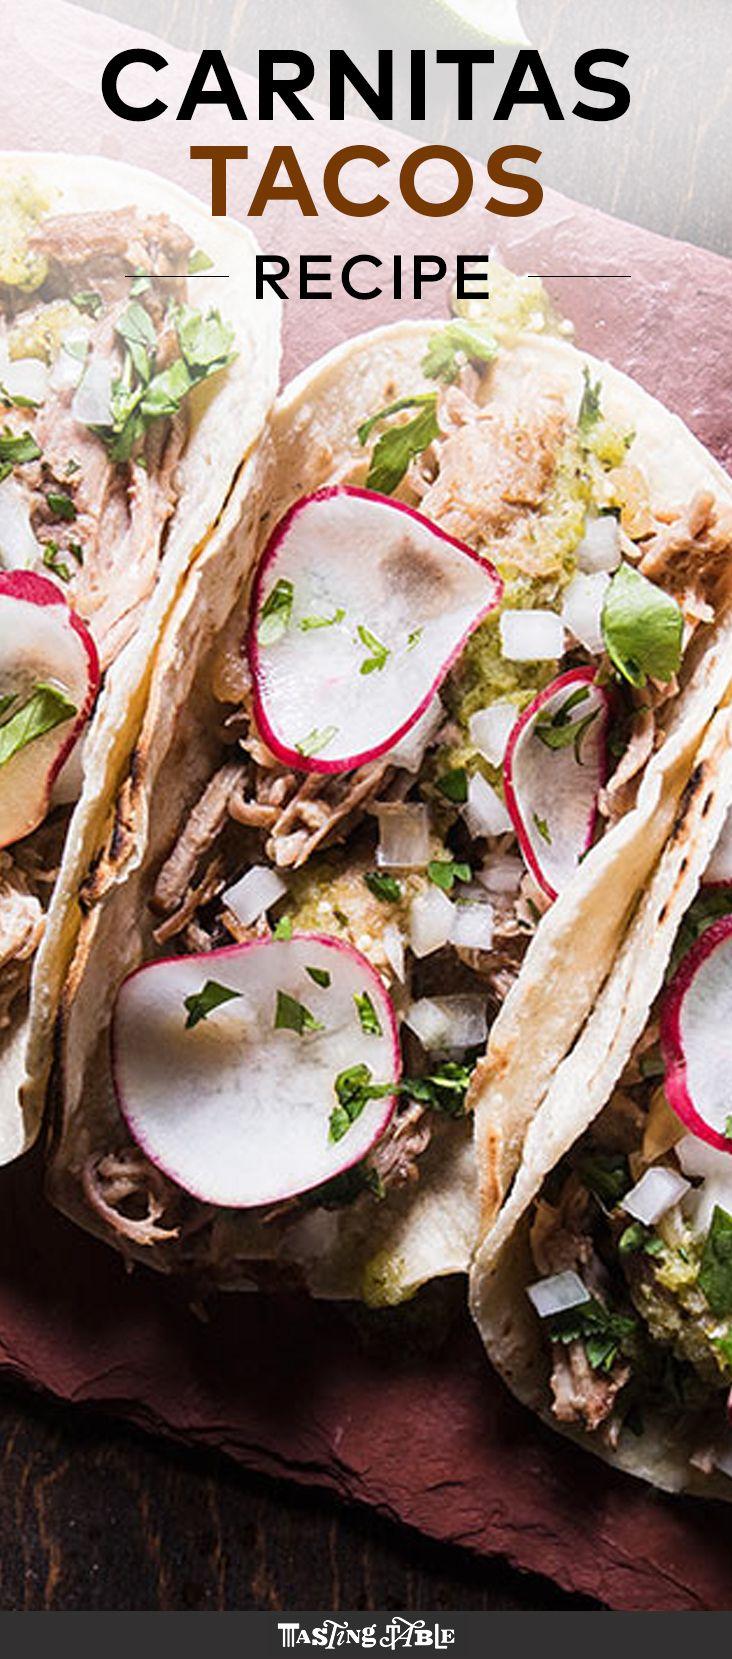 Fill your tacos with citrusy shredded pork, a vibrant tomatillo salsa and crunchy fresh veg.